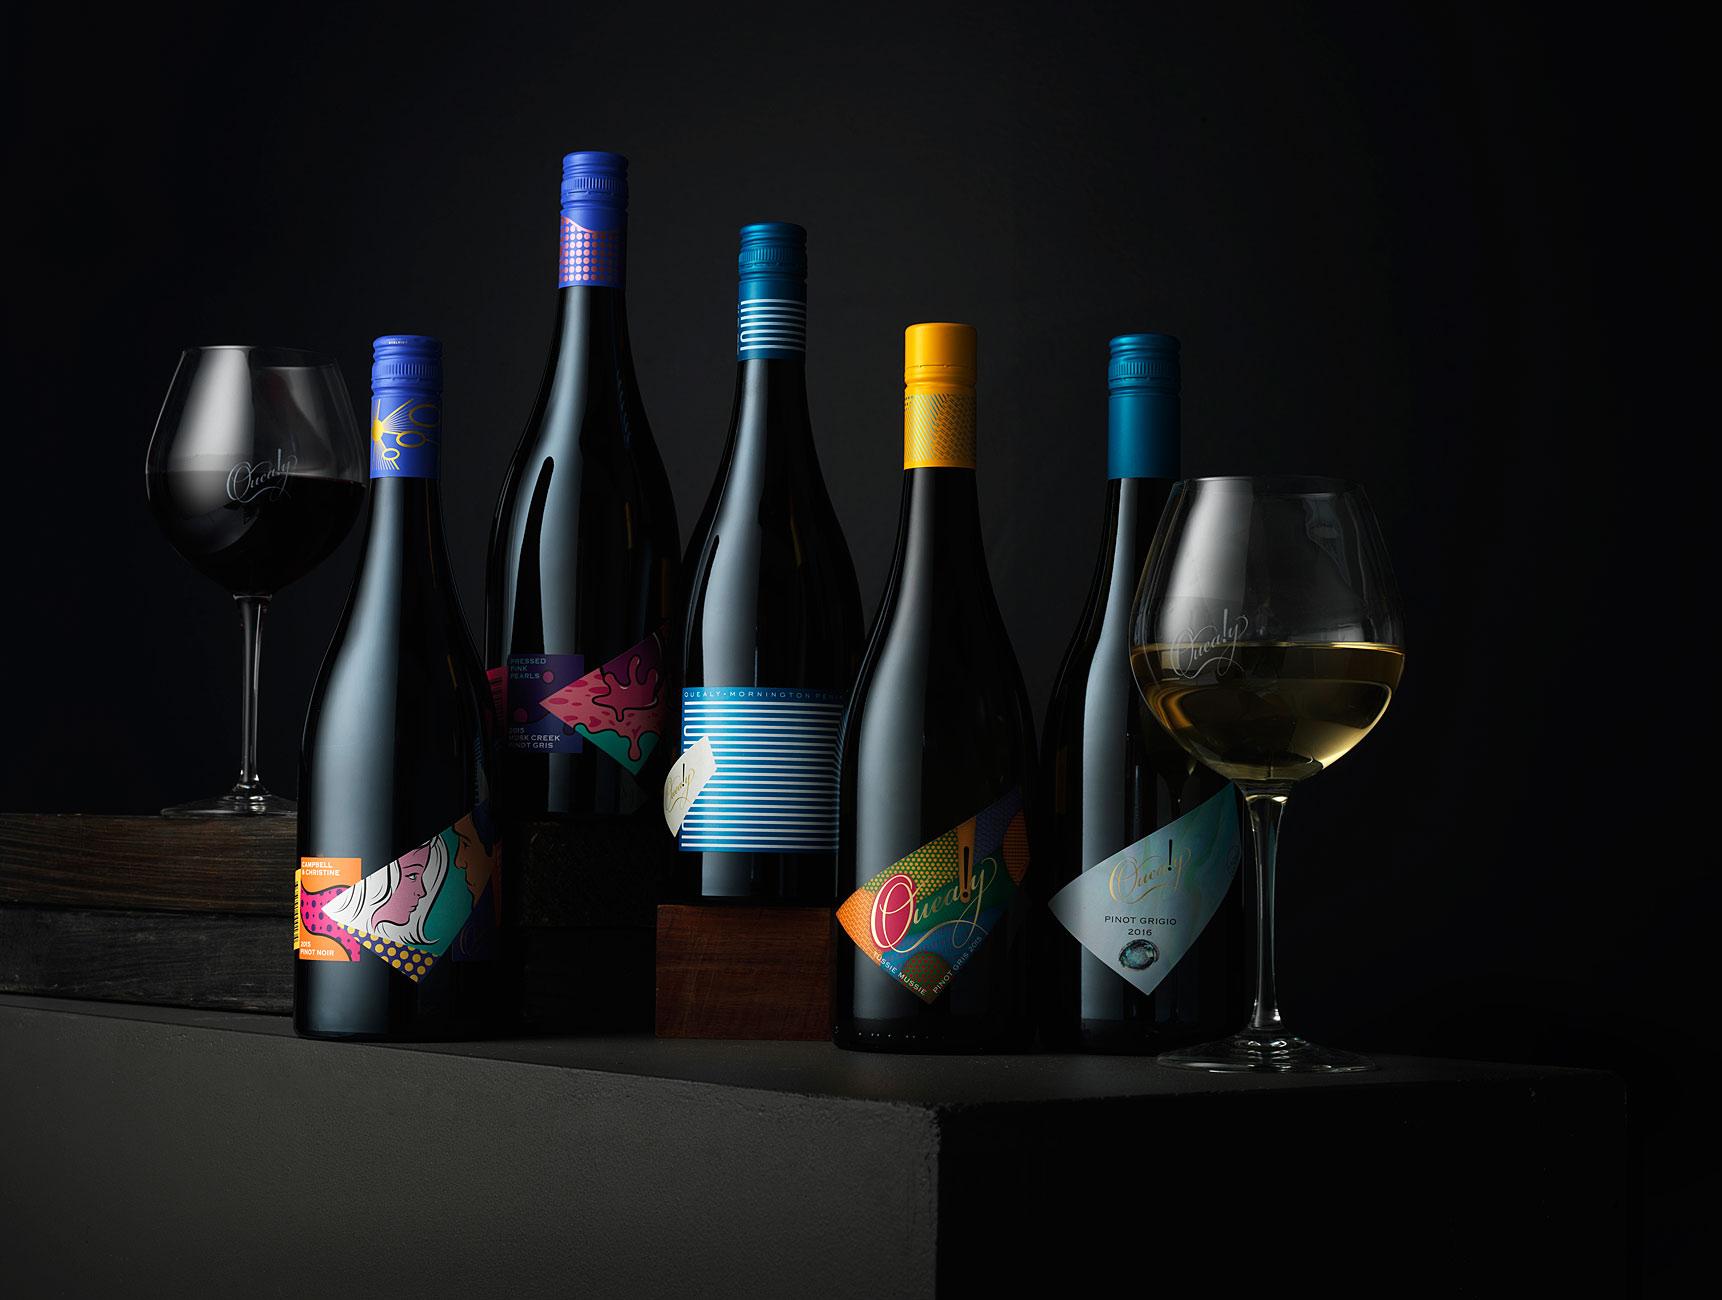 wine-bottle-photography-ijproductions2.jpg